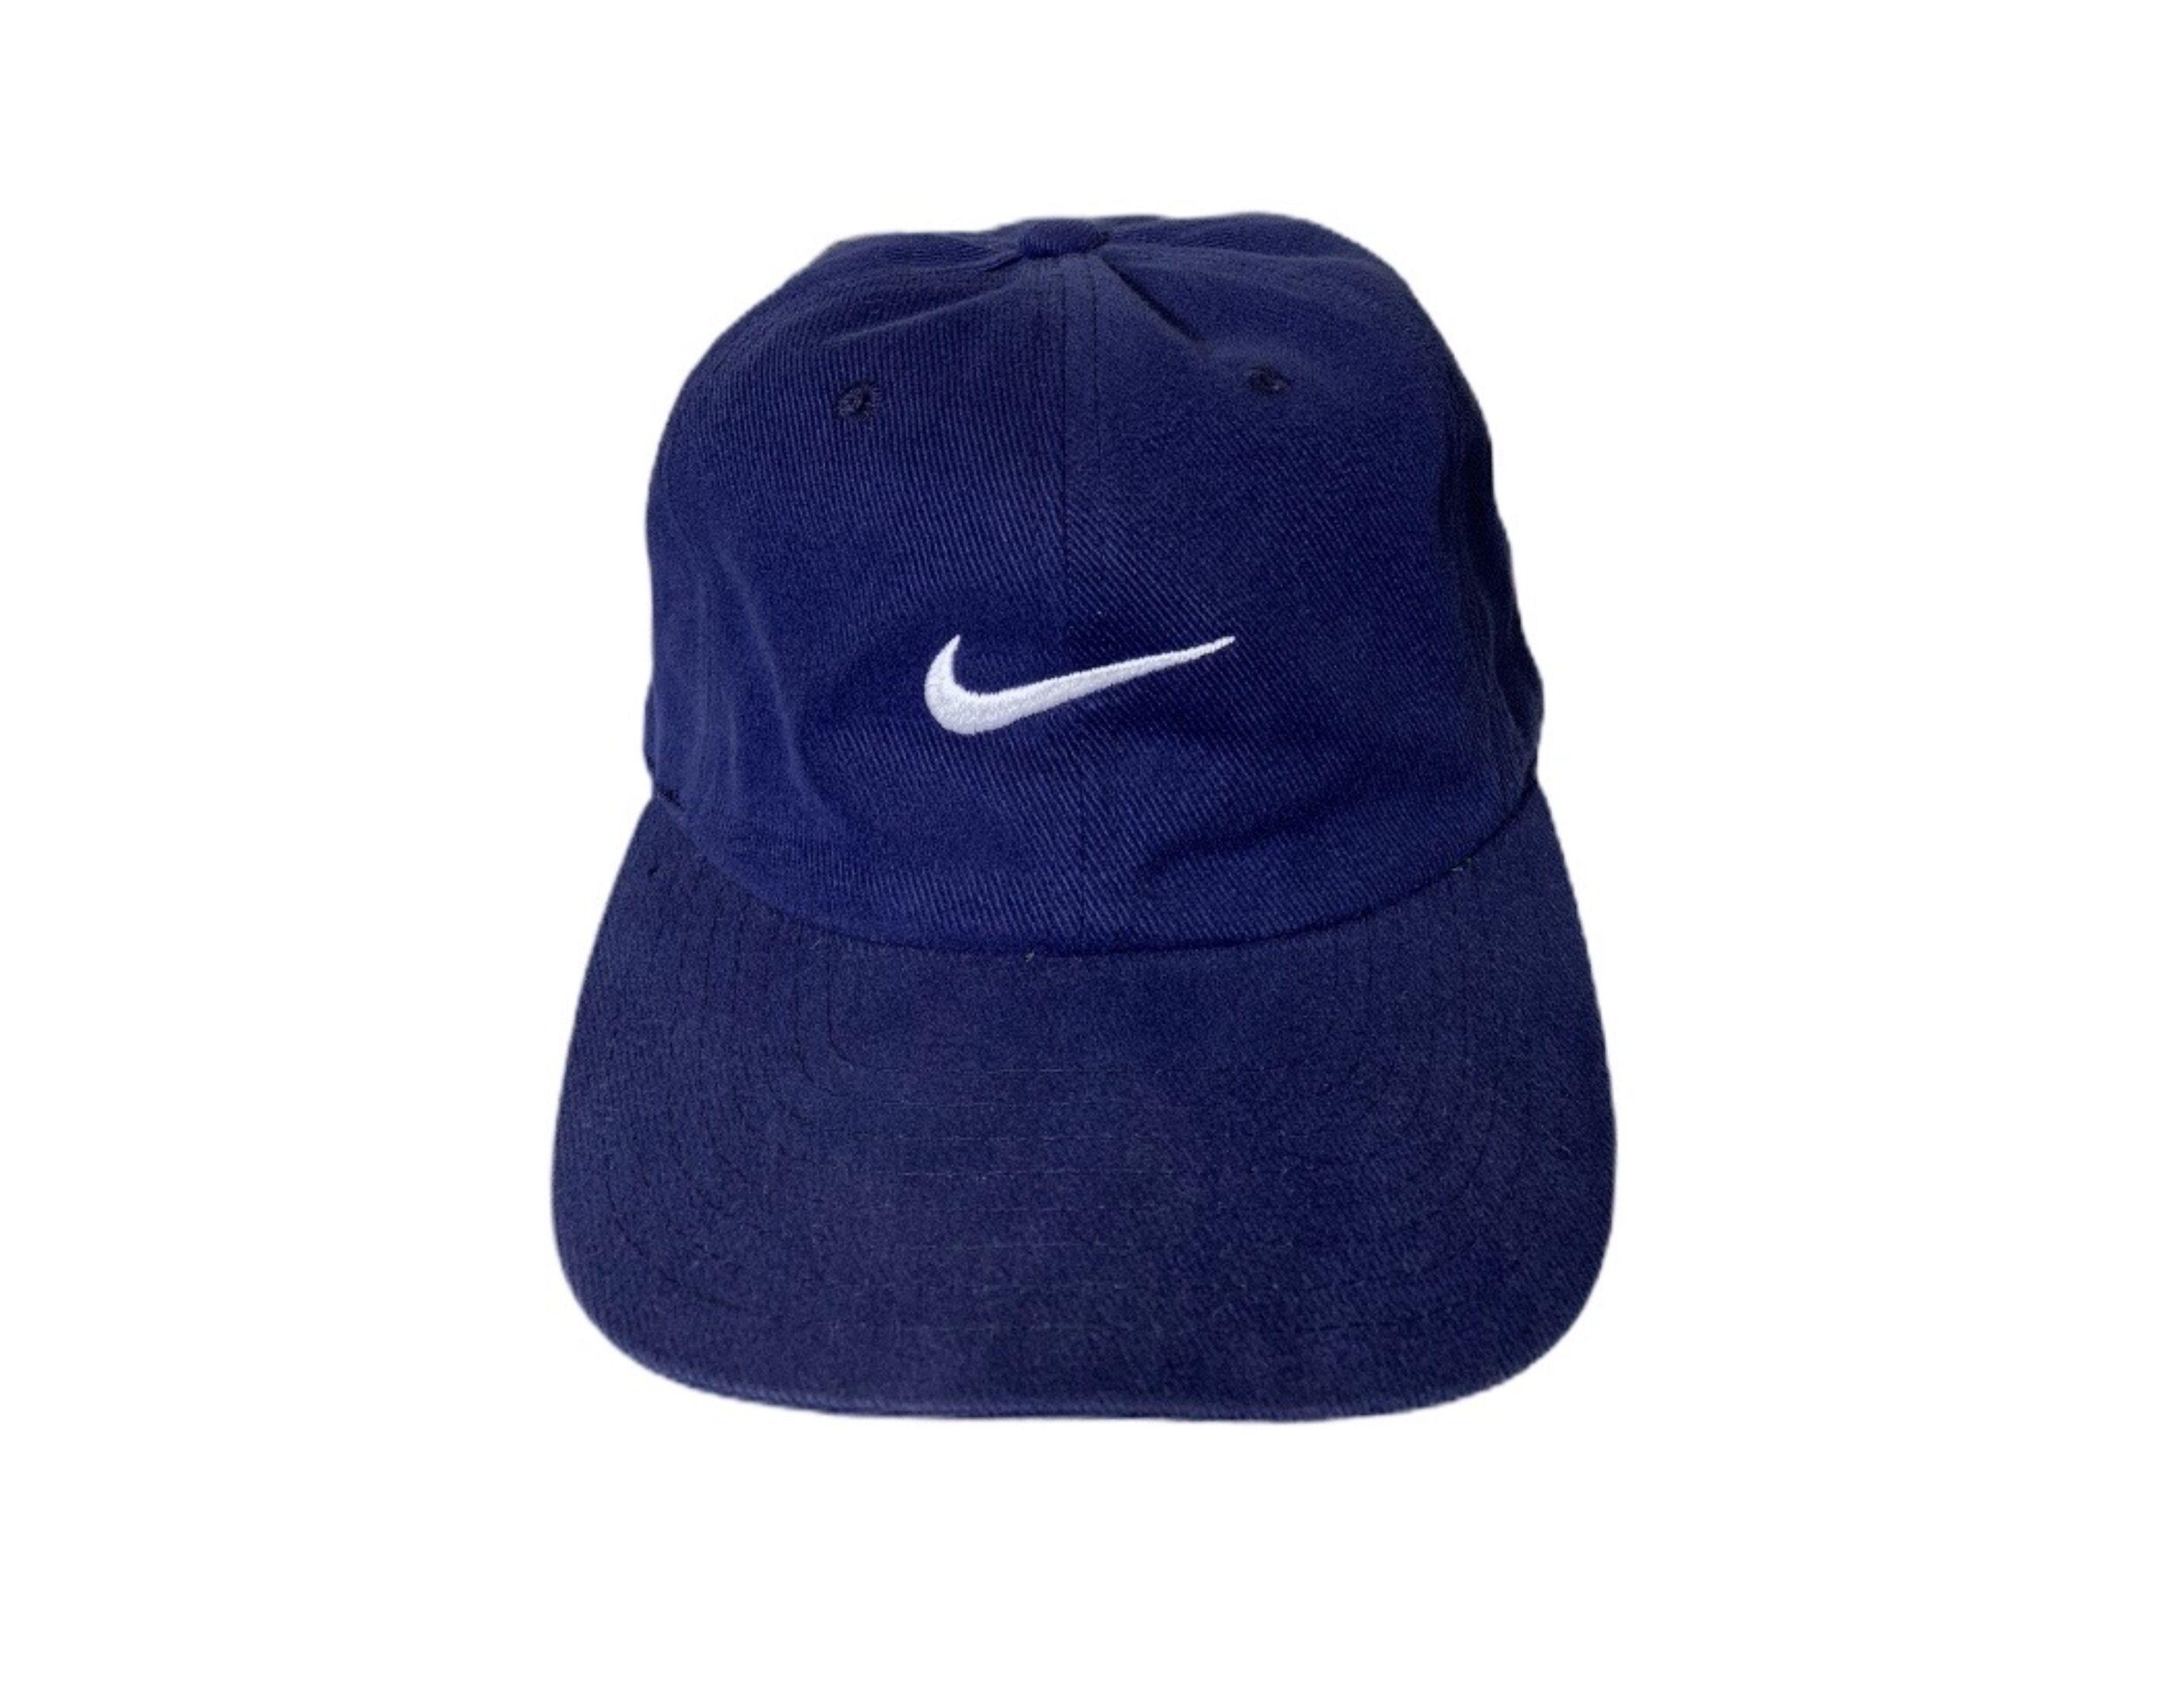 Vintage Nike sapka